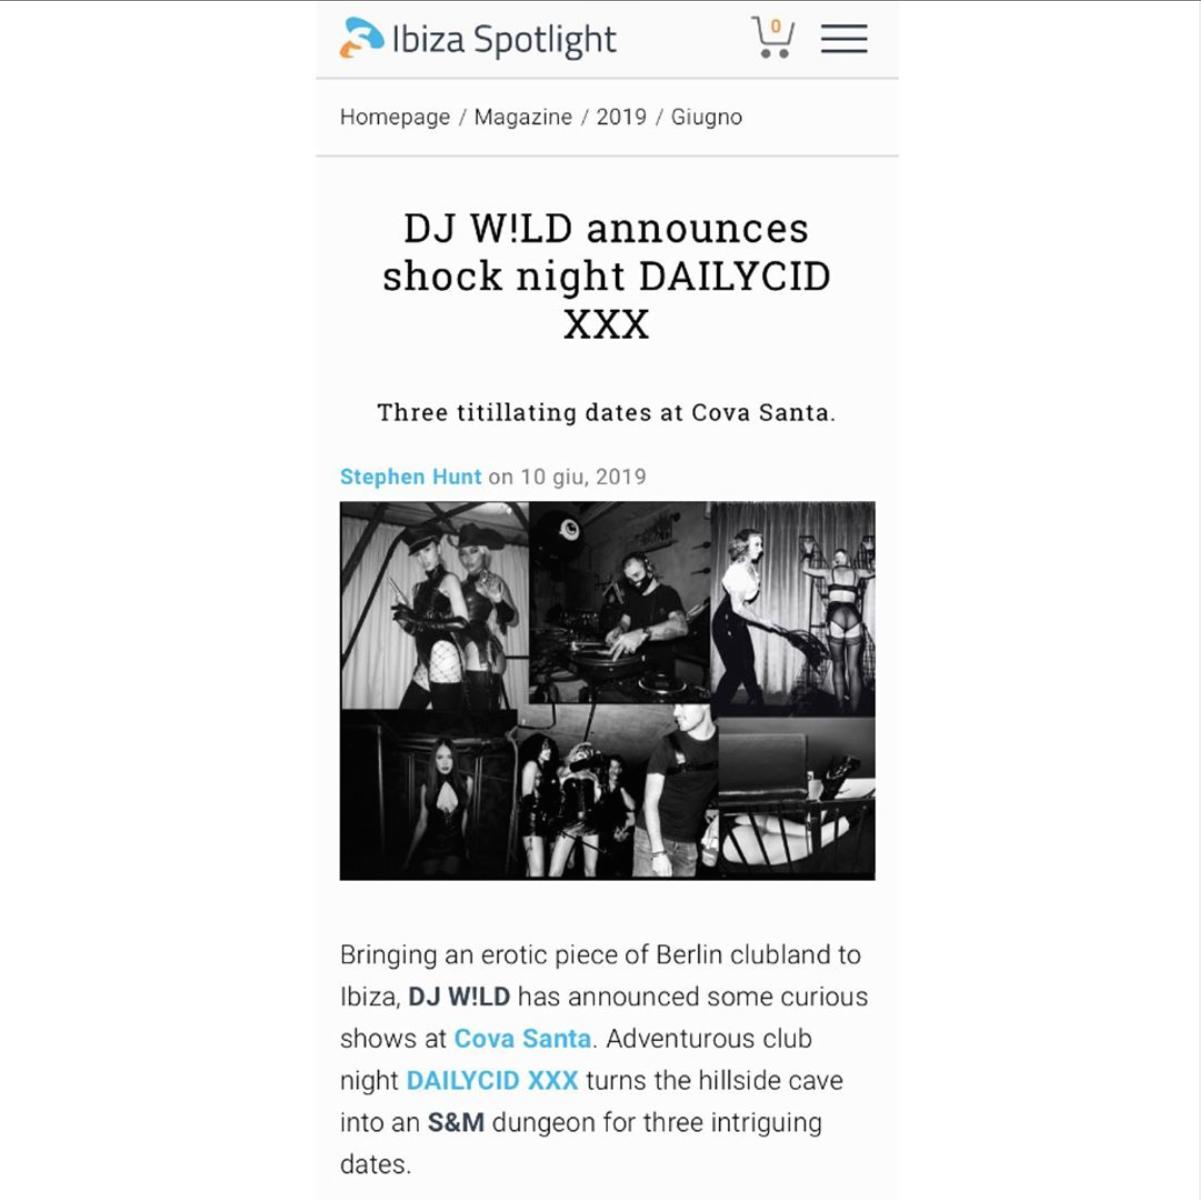 dj wild ibiza spotlight 13:06.png